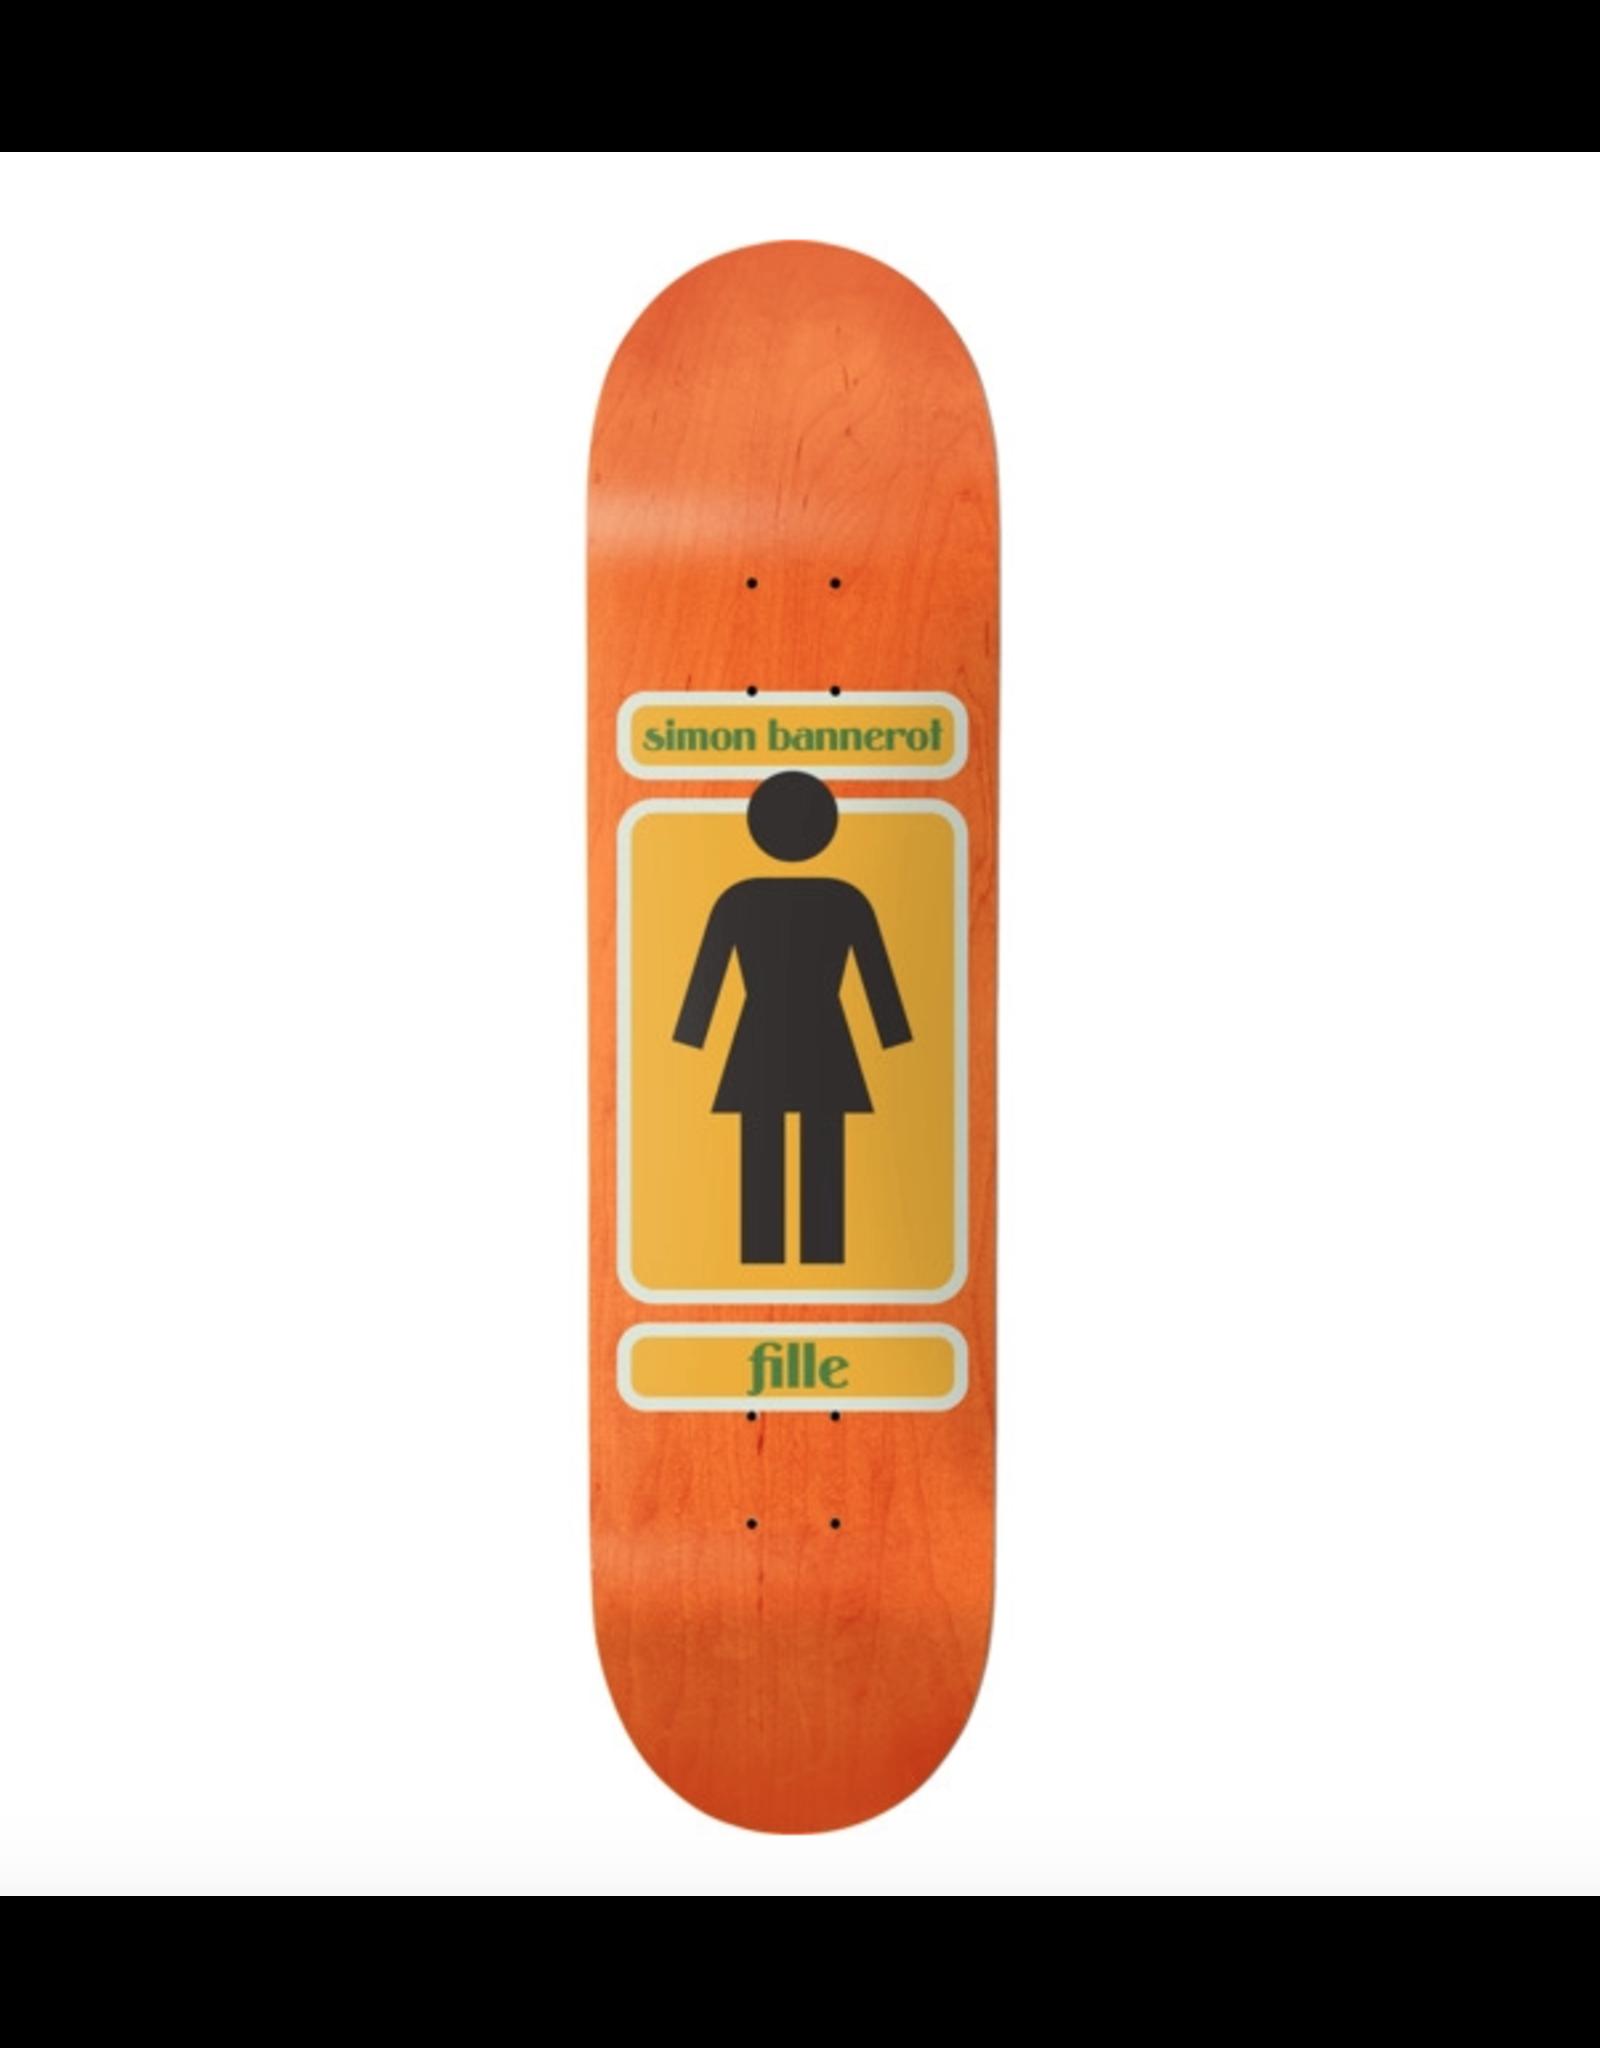 Girl Skateboards Simon Bannerot 93 Til Skateboard Deck 8.5 x 32 with Jessup Black Griptape Bundle of 2 Items